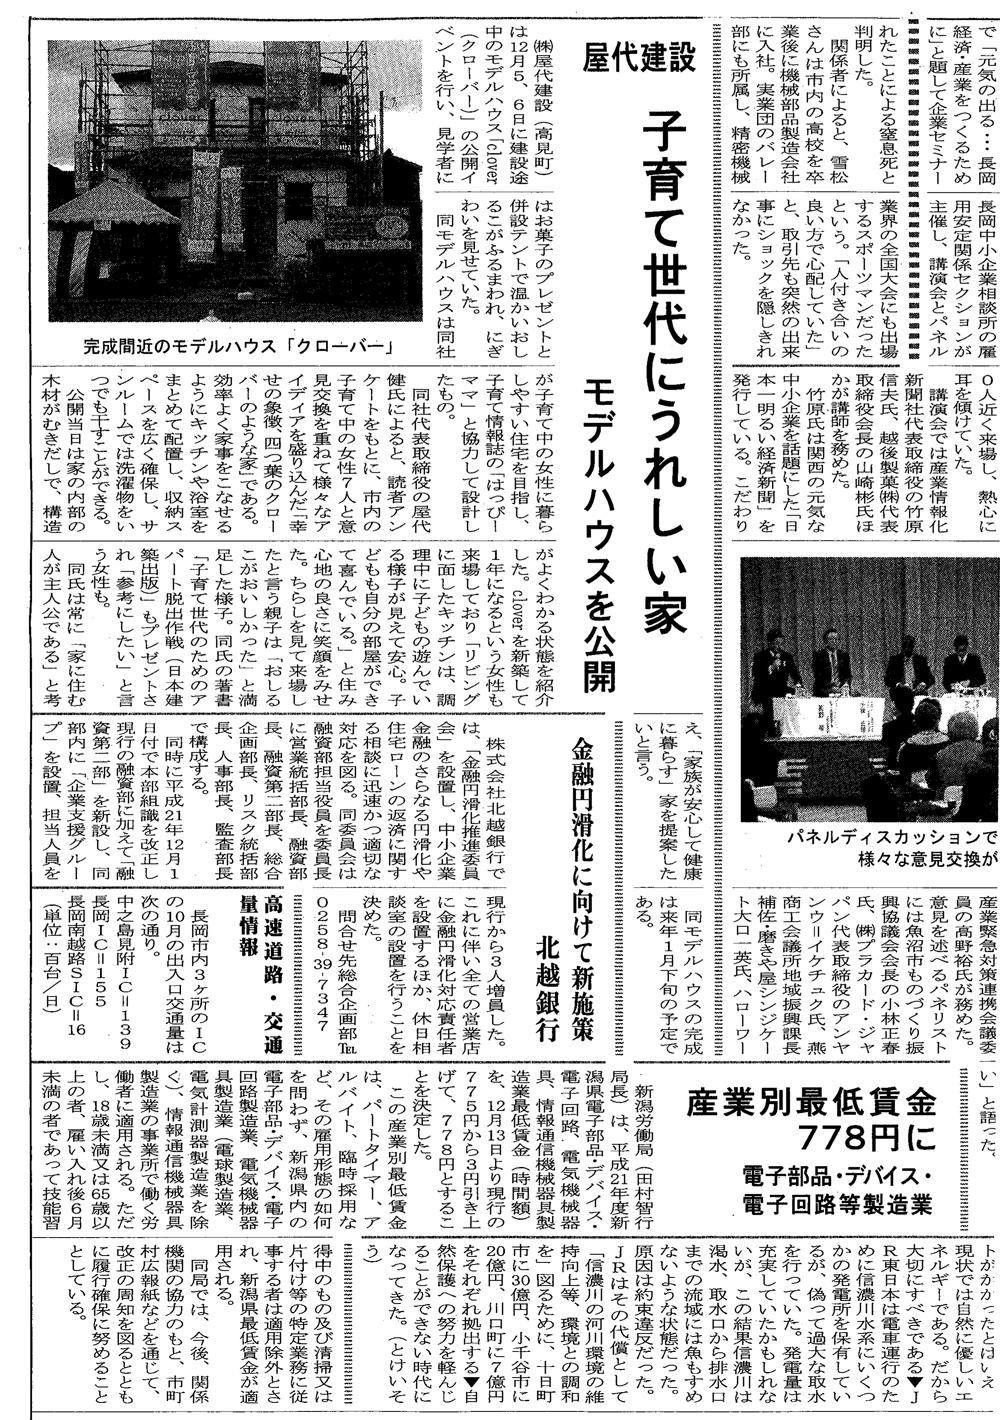 http://www.yashiro-kensetsu.co.jp/20091210_l.jpg